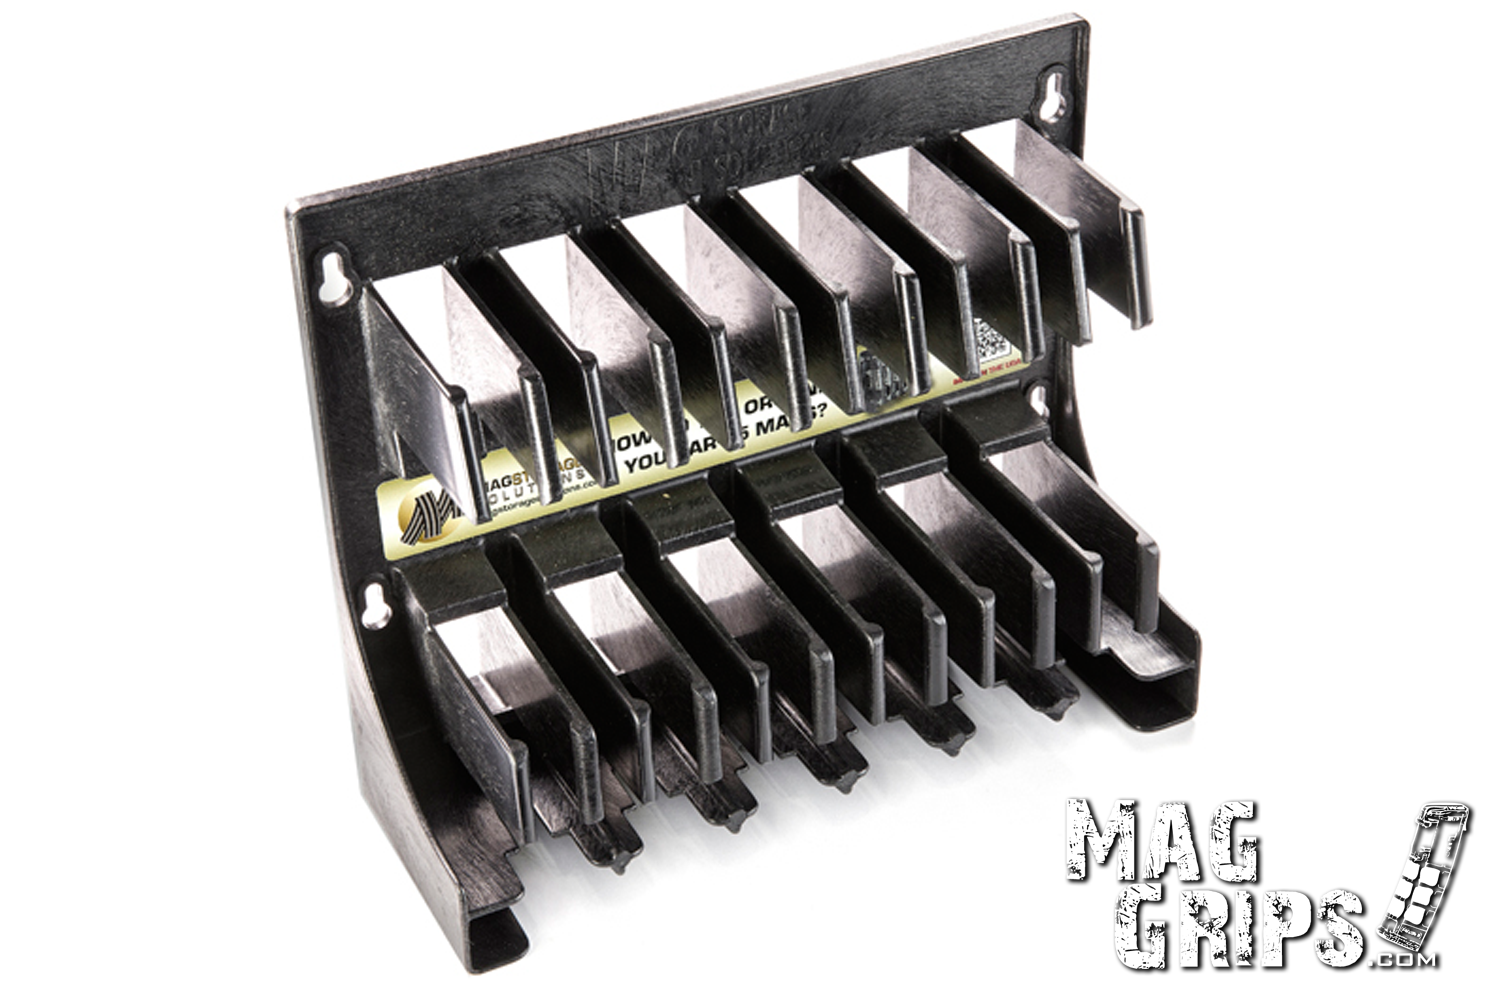 Mag Storage Solutions AR 5.56 .223 Magazine Rack With Magazines